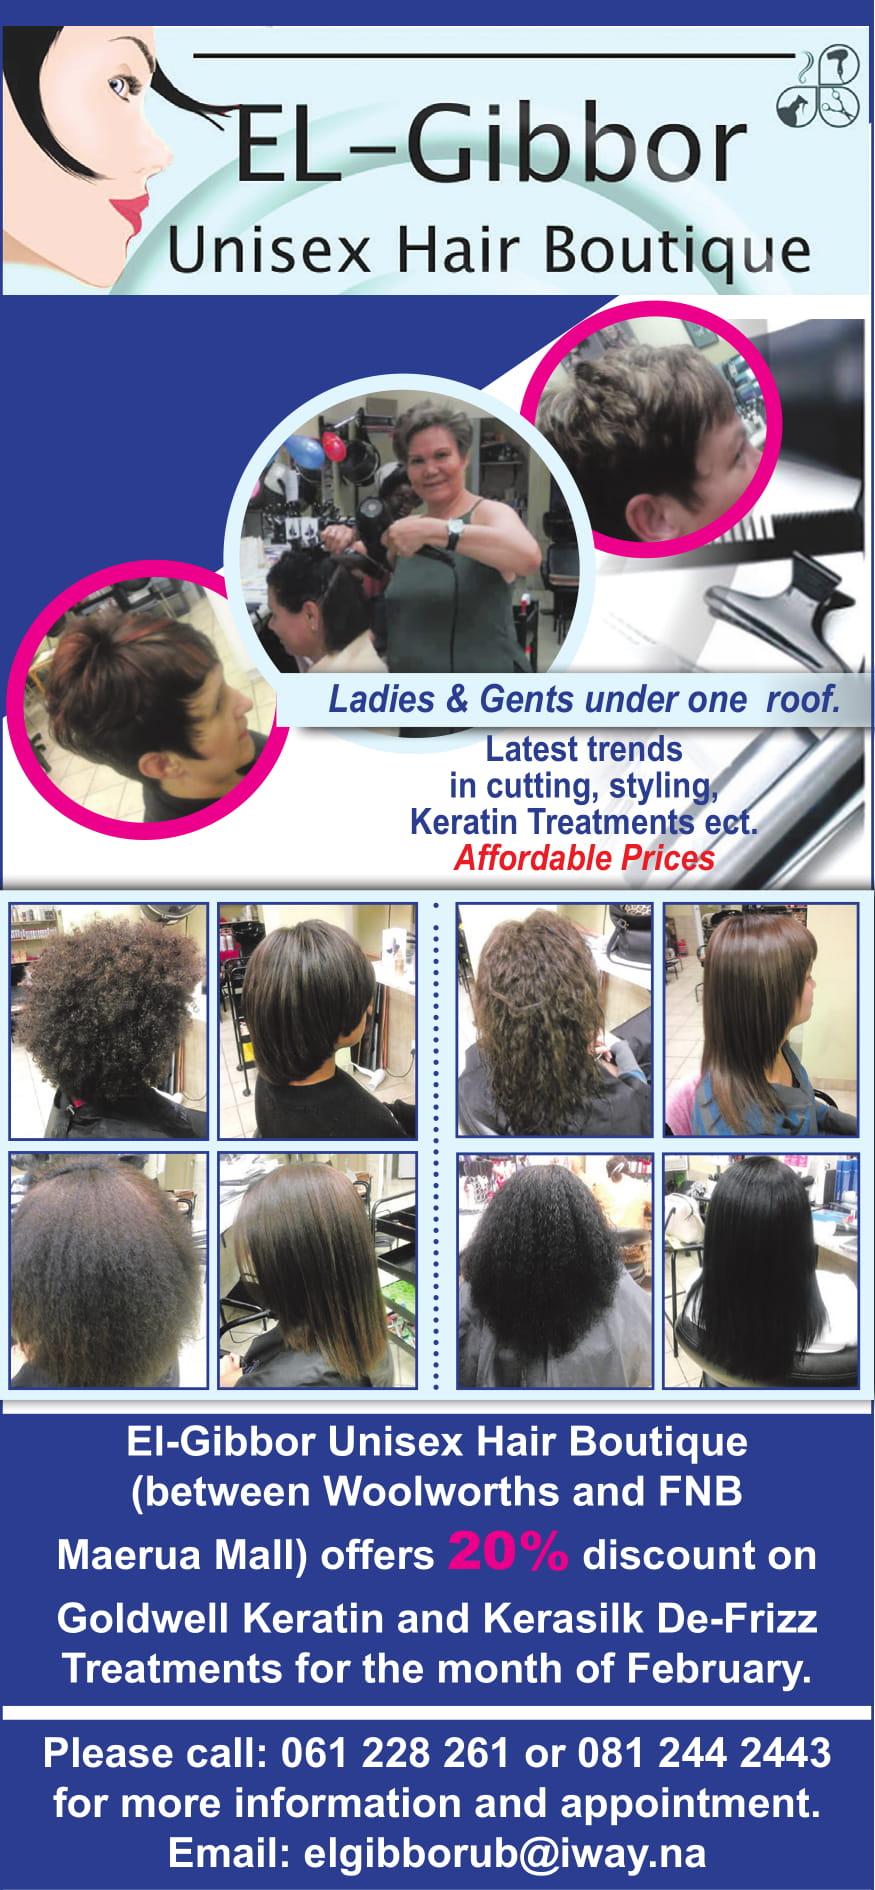 El-Gibbor Uni Sex Hair Boutique